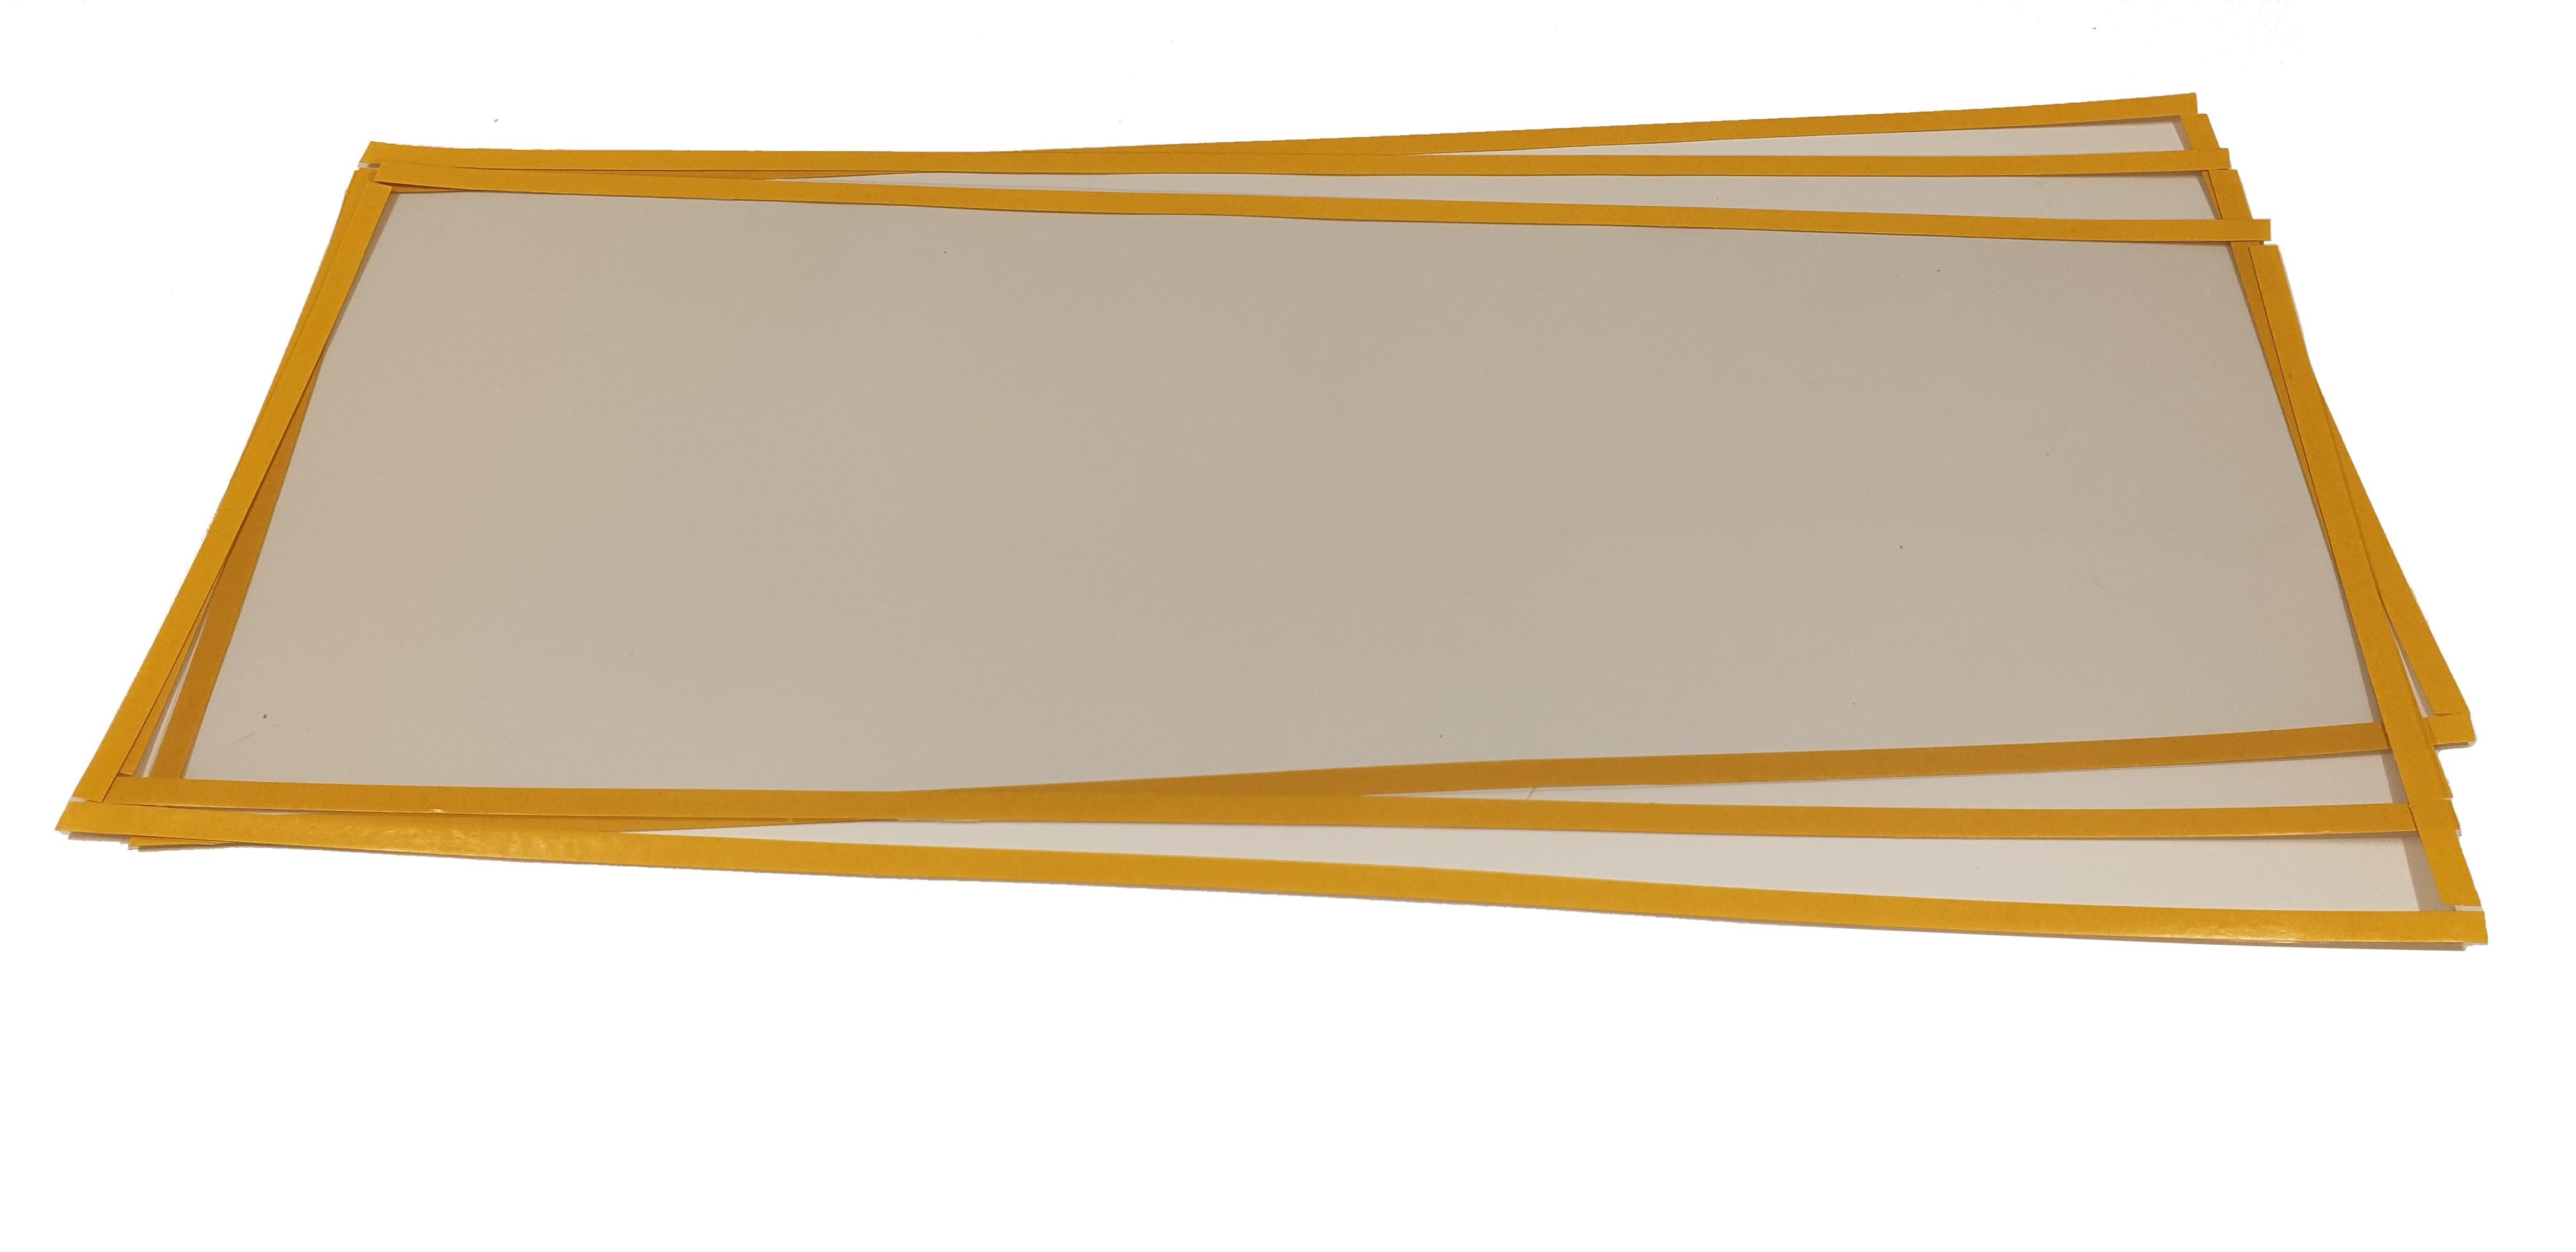 1 Pkg à 25 Stk. Schutzfolie f. Kabine OE 1500I